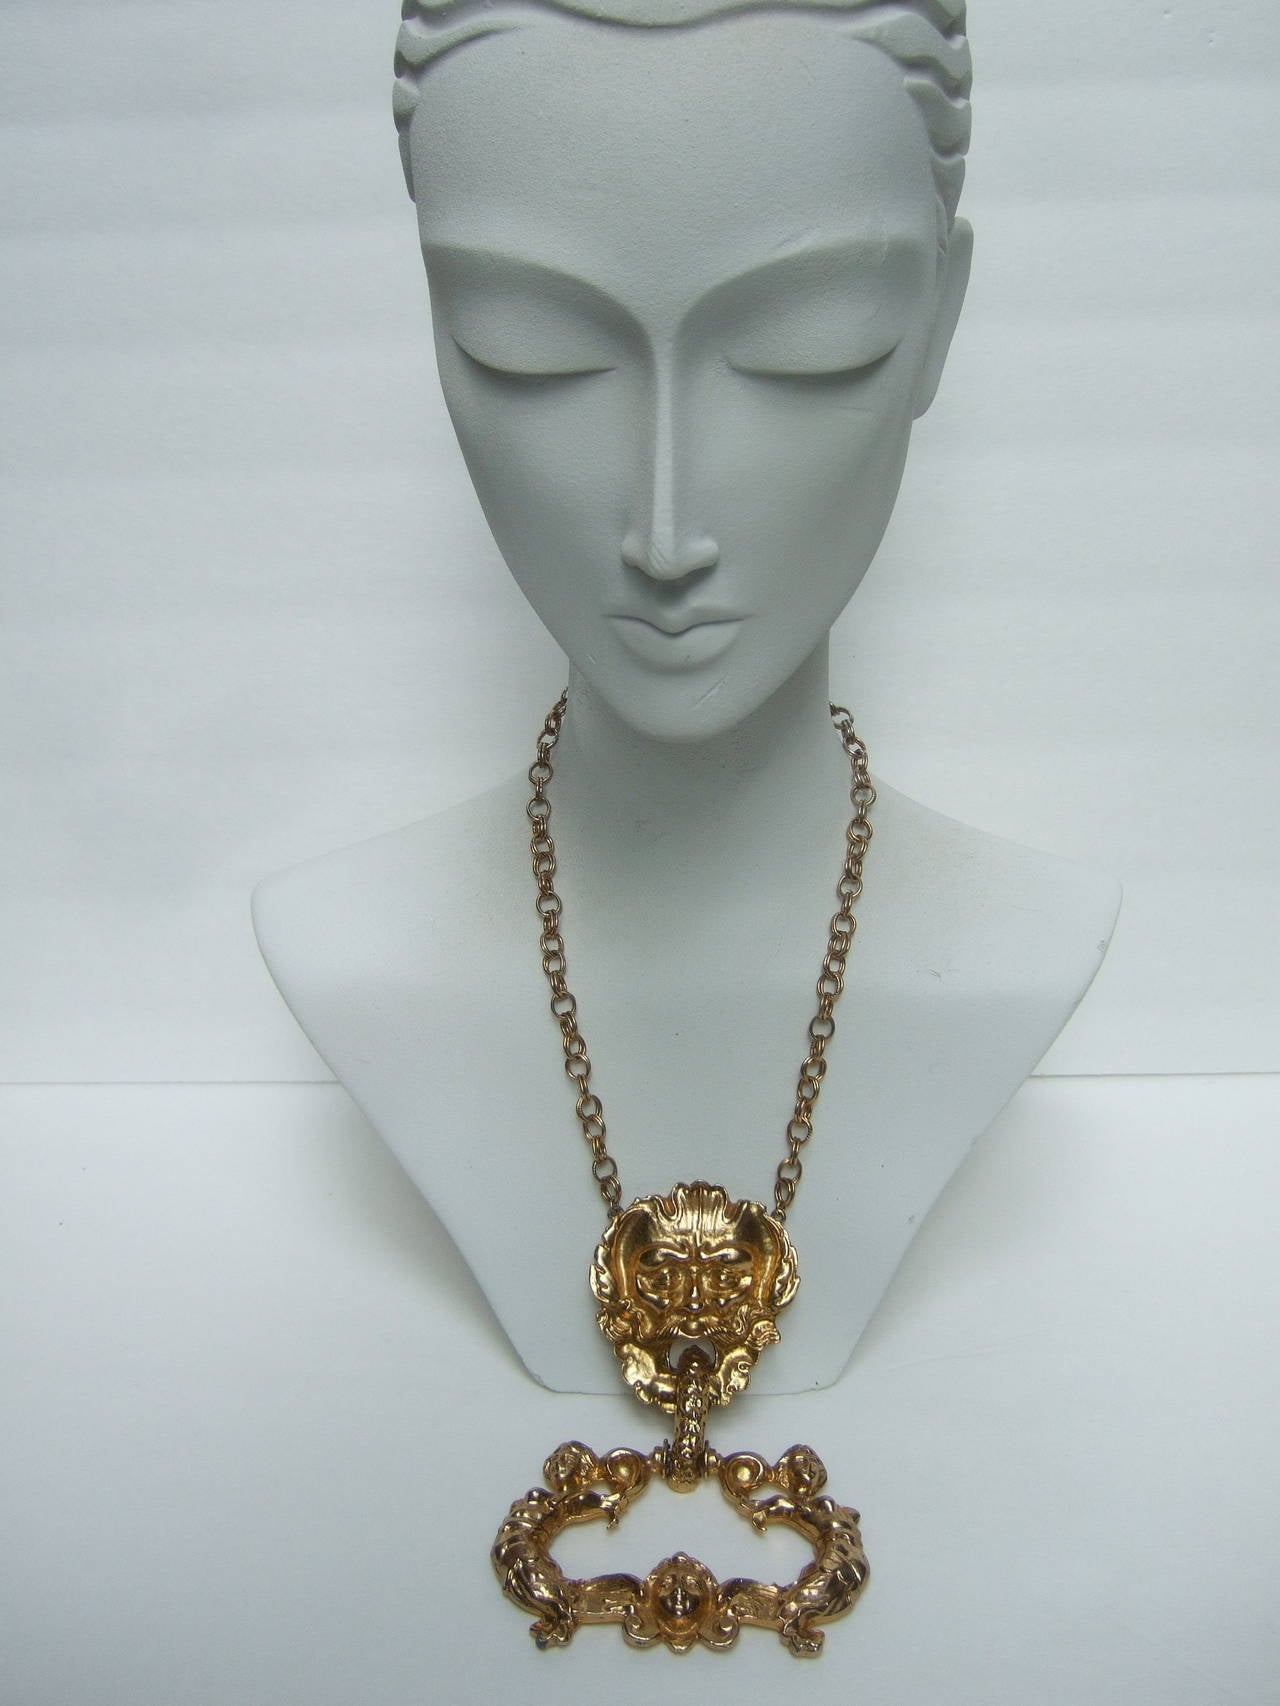 Massive Gilt Metal Figural Pendant Necklace c 1970 For Sale 4